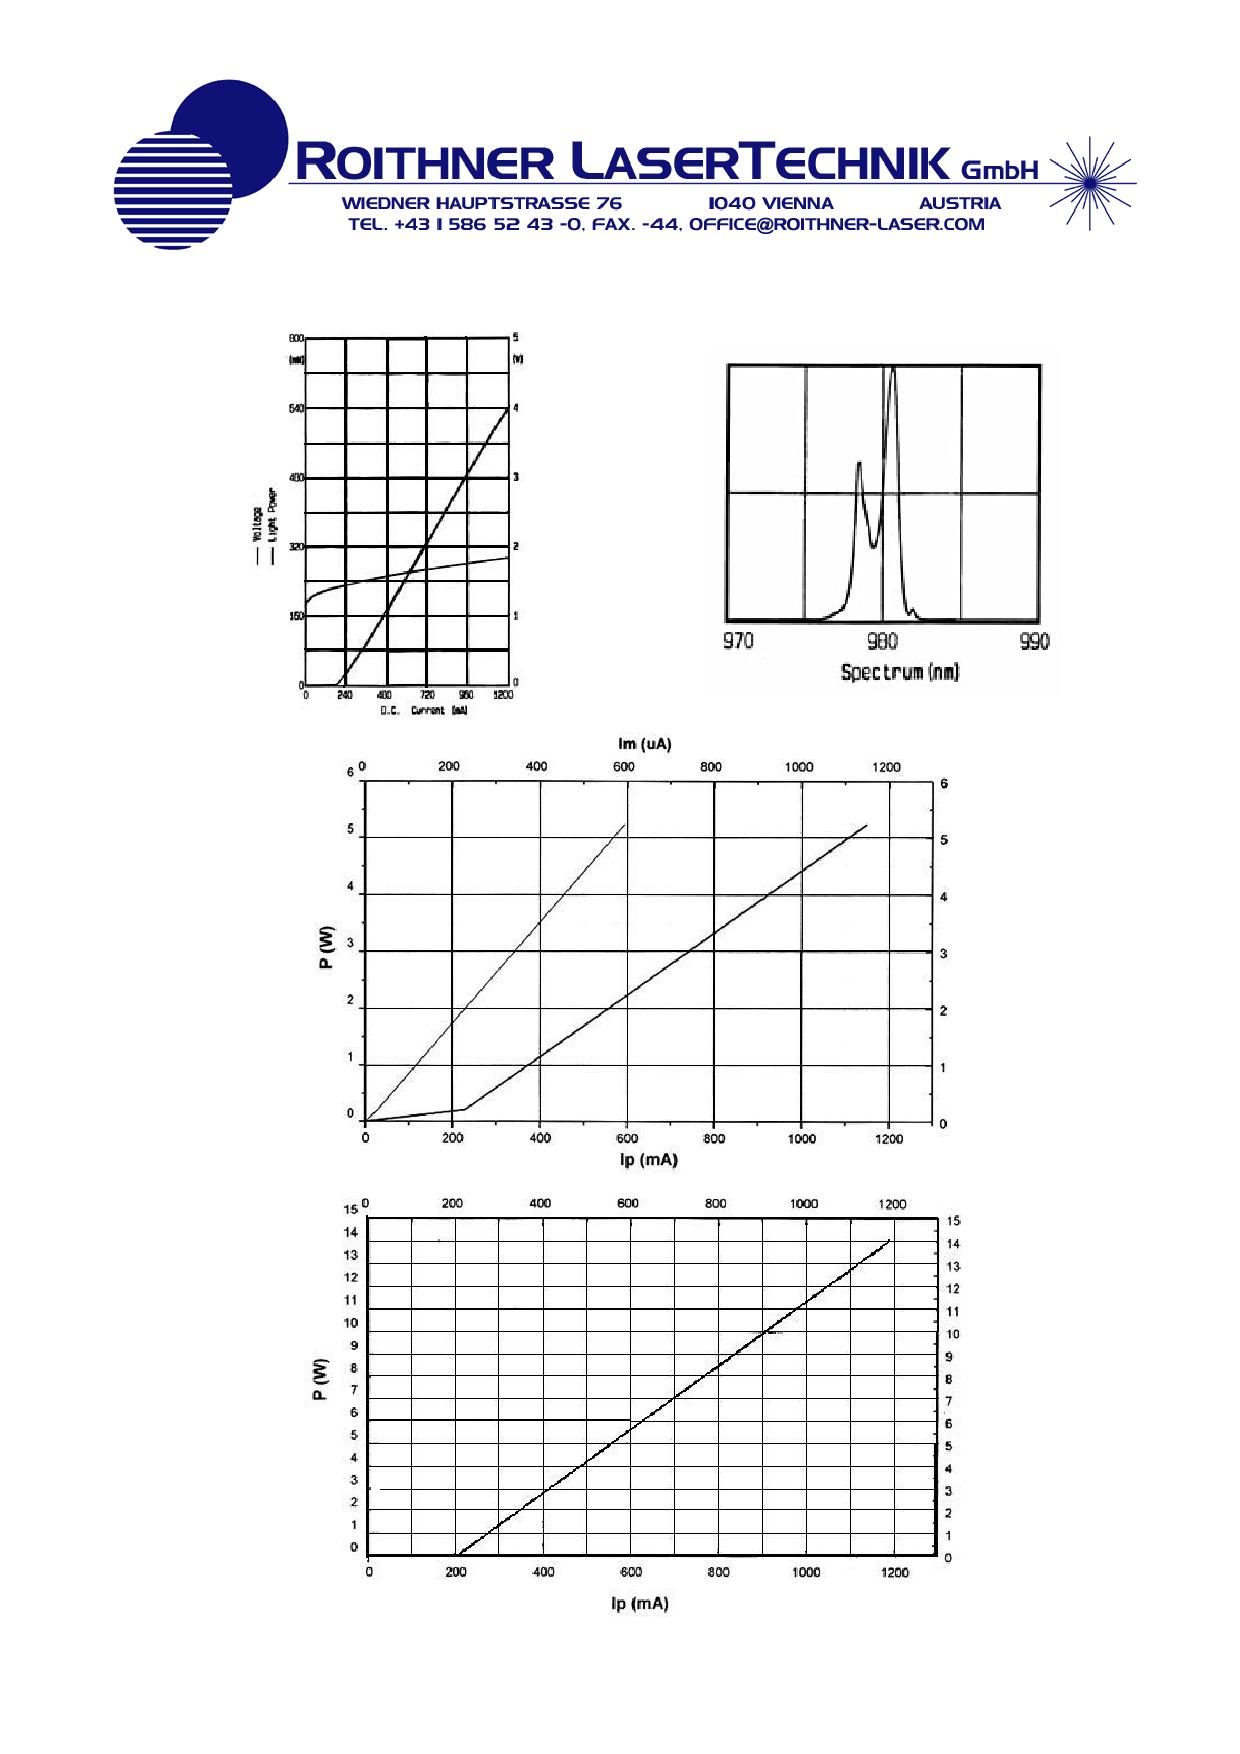 G098PU1750M pdf, 電子部品, 半導体, ピン配列